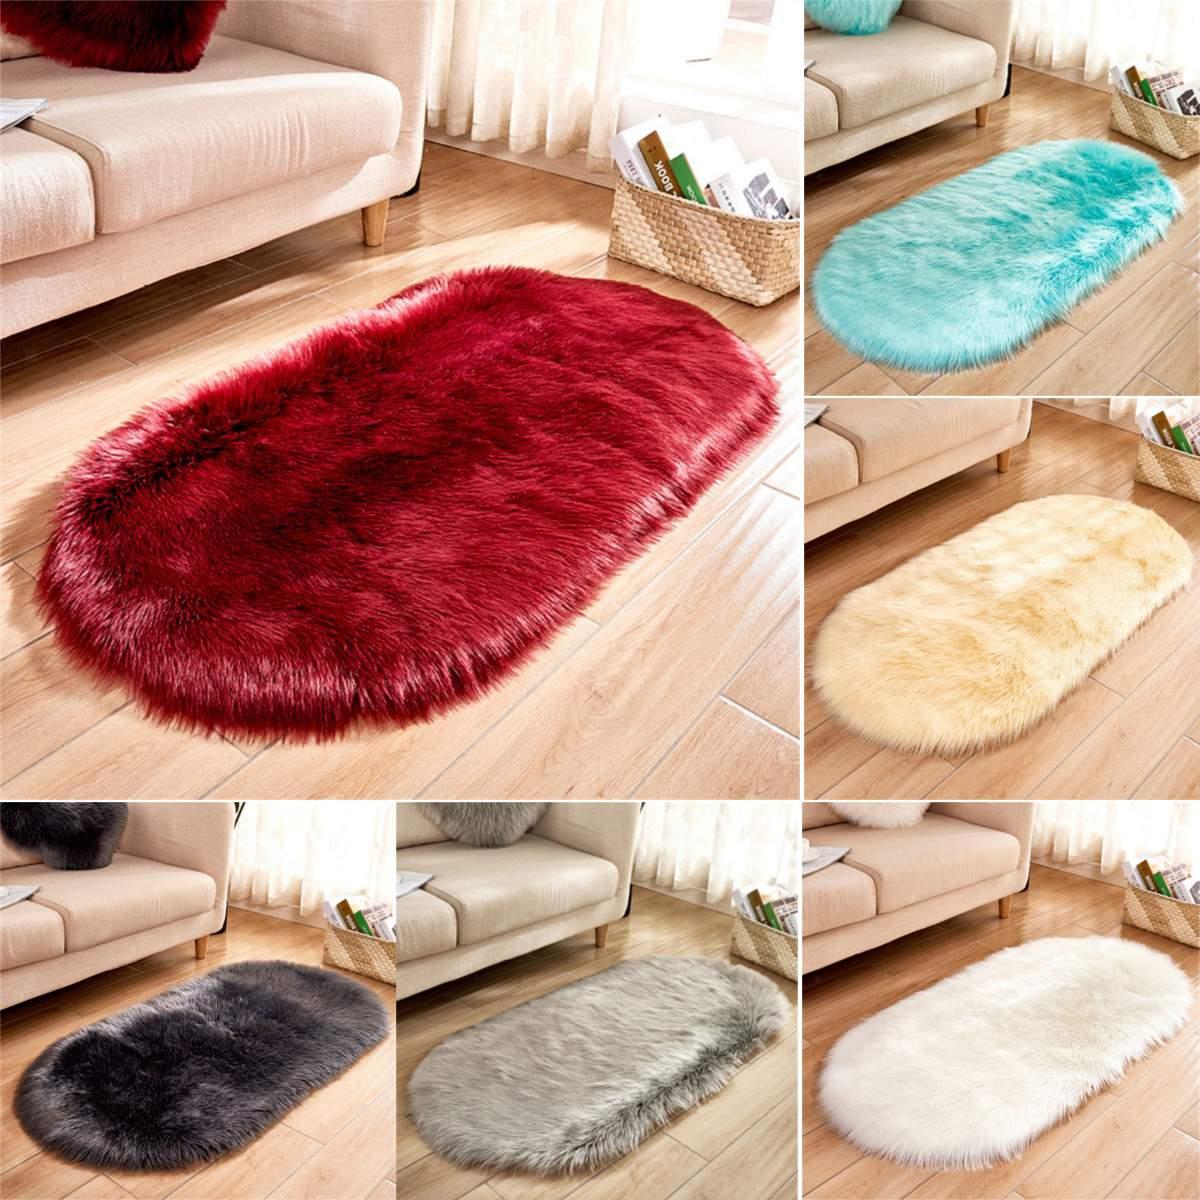 7 Colors Non Slip Oval Plush Area Rug Living Room Carpet